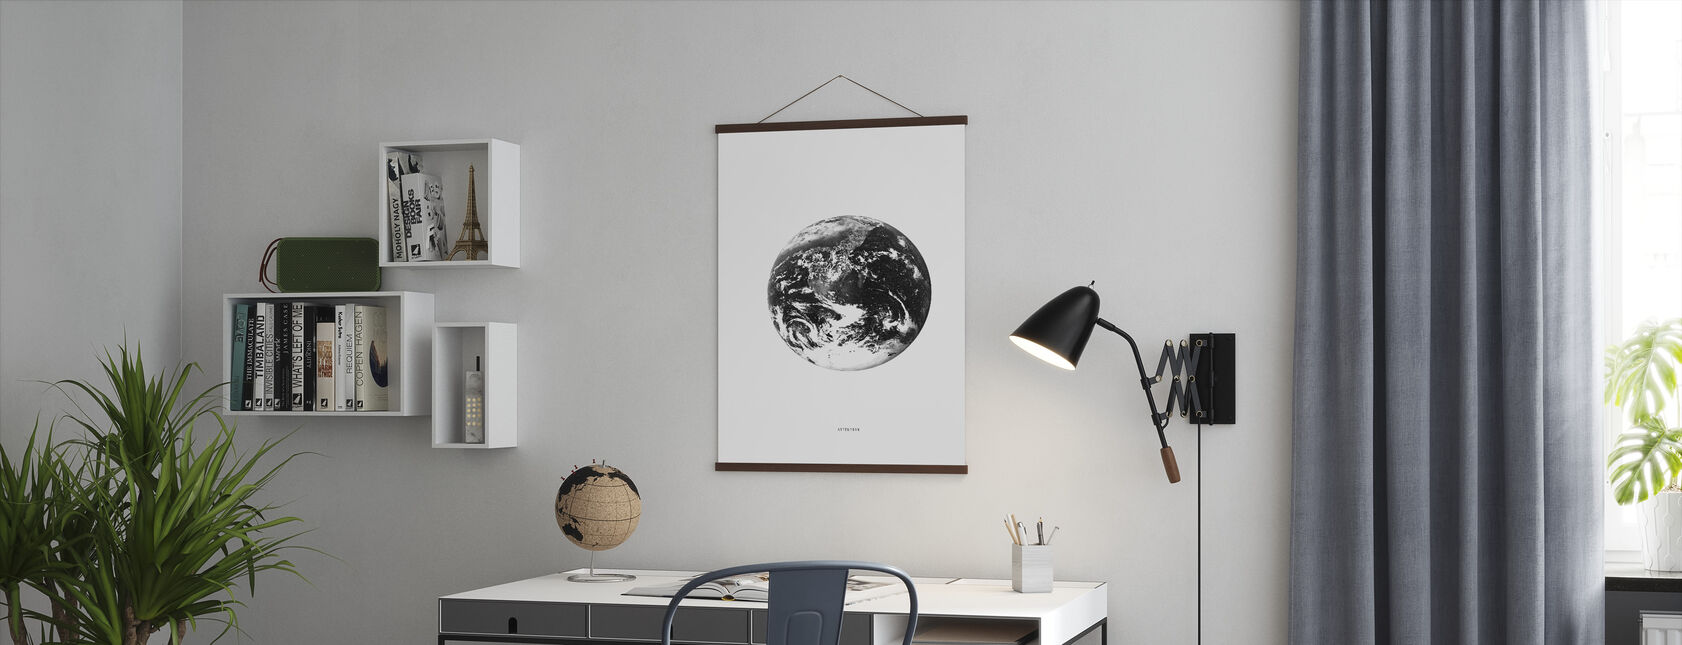 Aufmerksamkeit - Poster - Büro